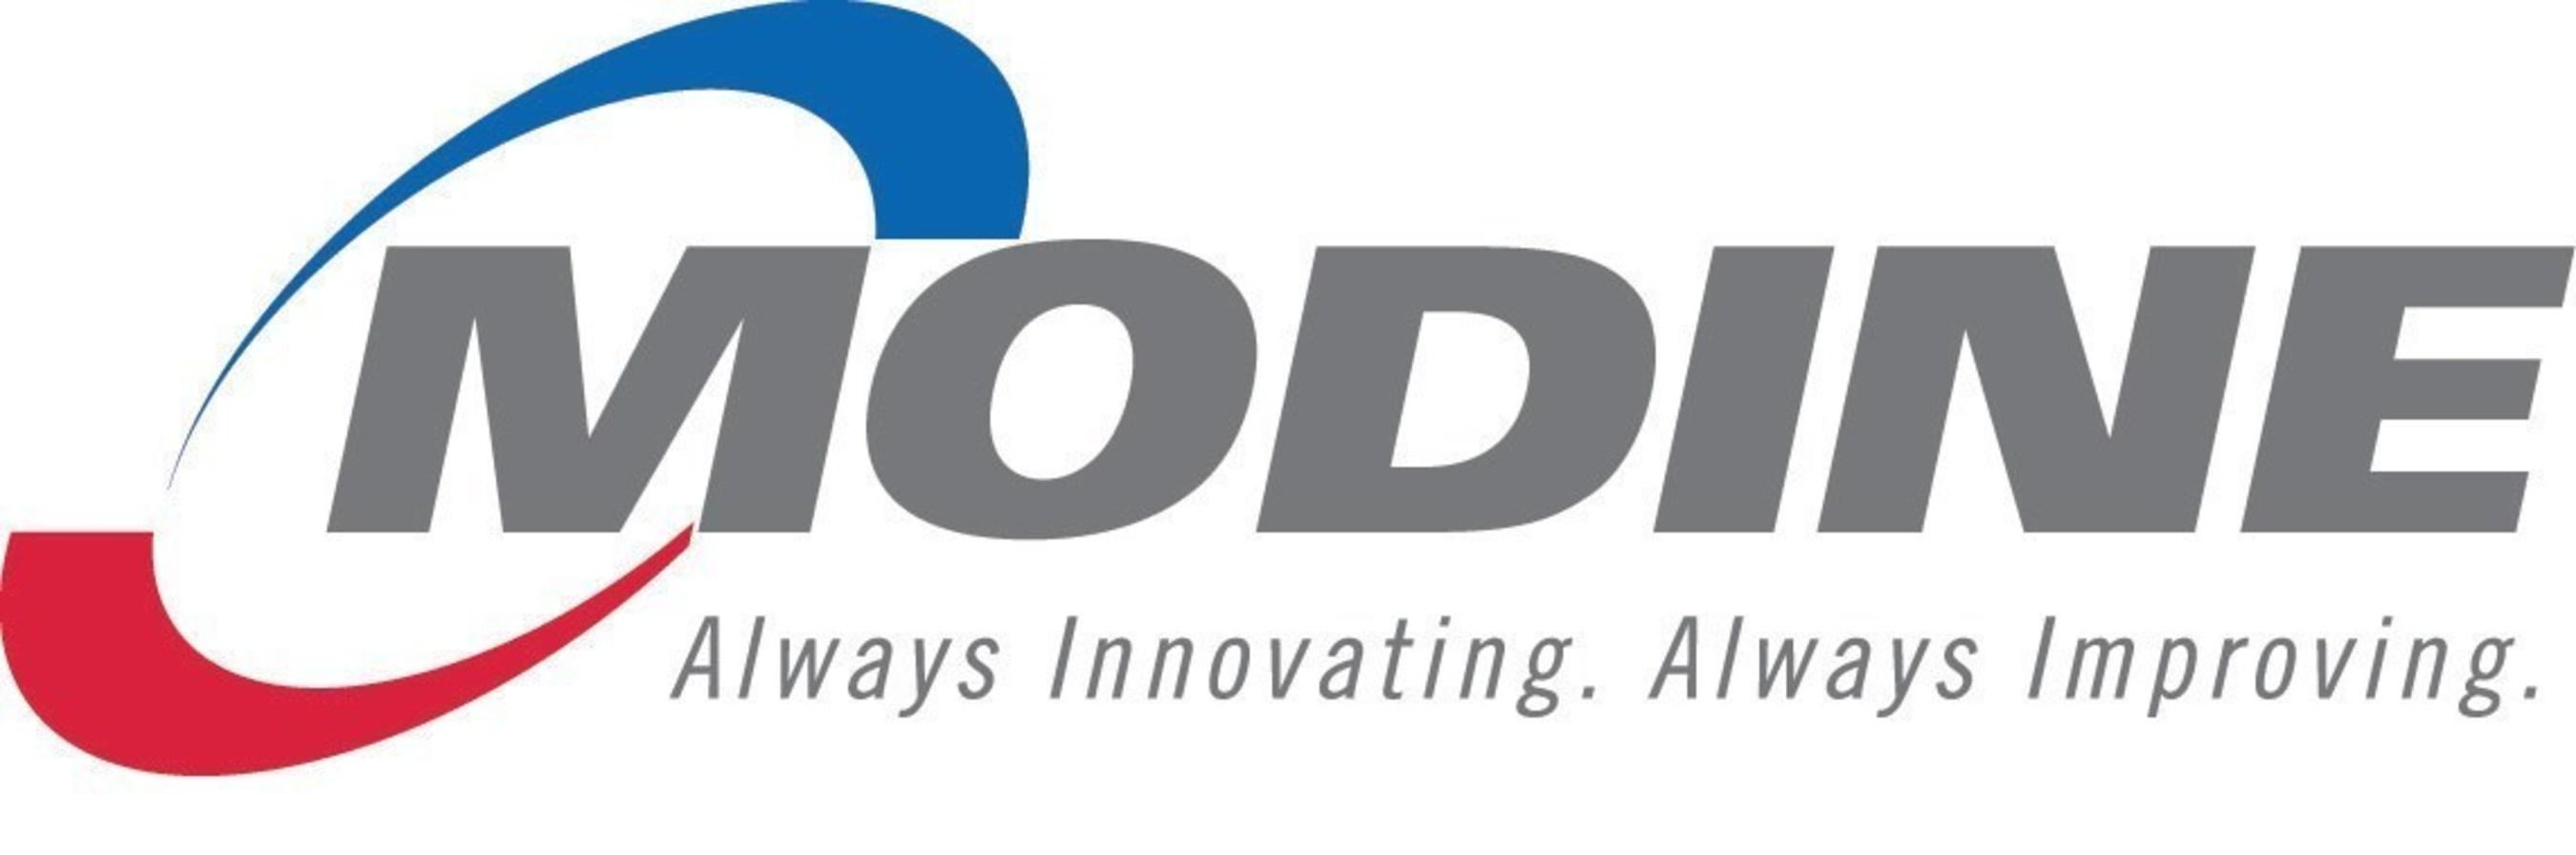 Modine Completes Acquisition of Luvata Heat Transfer Solutions  Modine Complete...